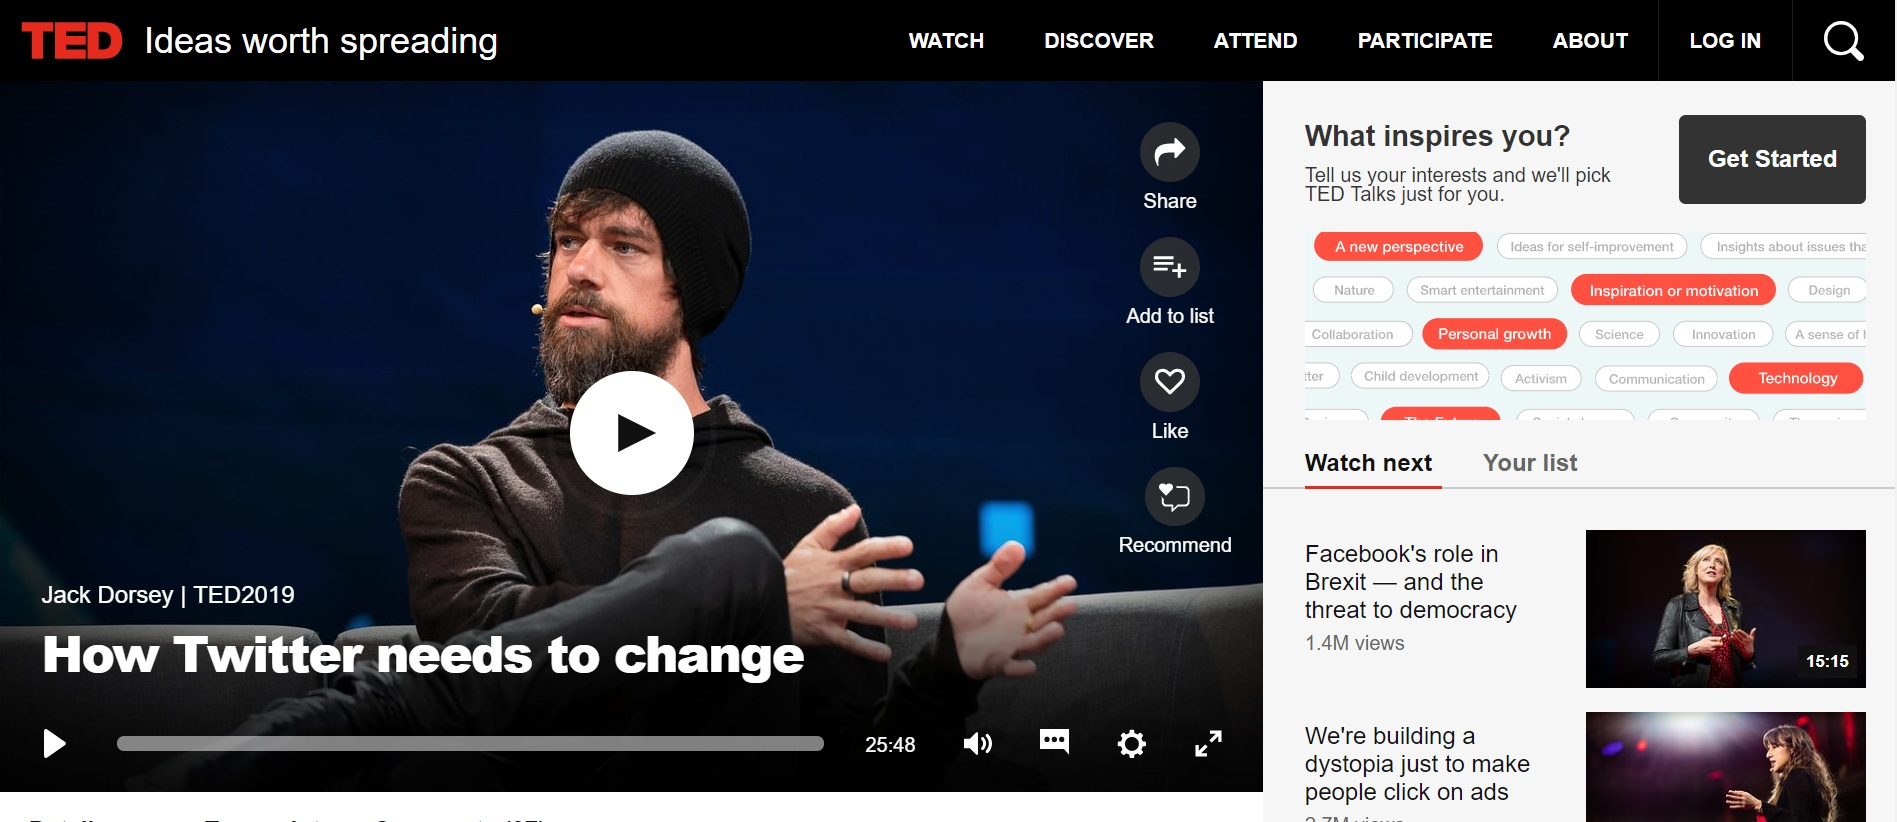 Jack+Dorsey++How+Twitter+needs+to+change+++TED+Talk.jpg